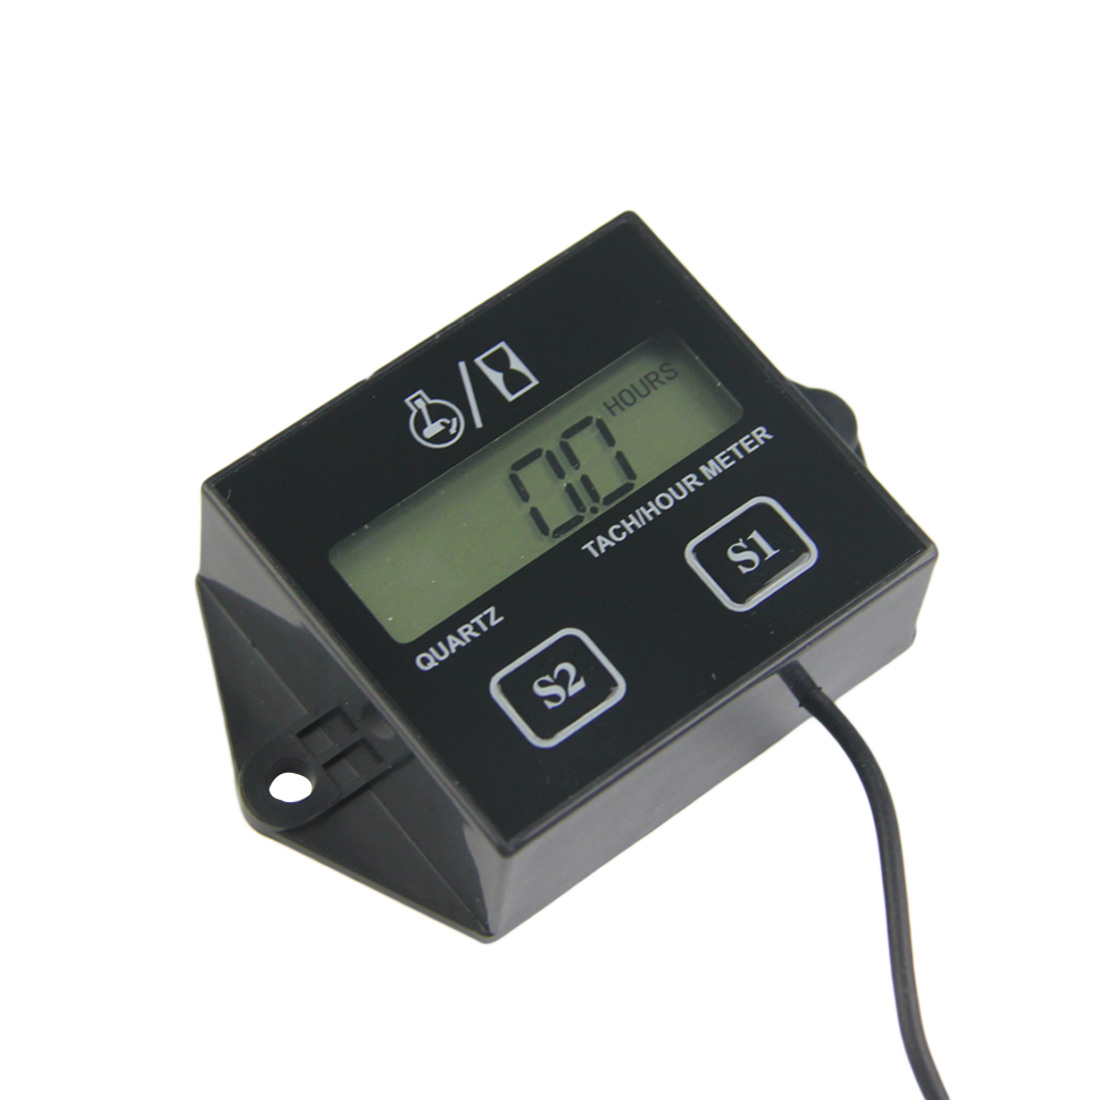 Tech Stunde Meter Digital Motor Tachometer-lehre Induktive Für Motorrad Motor 4-takt-motor Funken